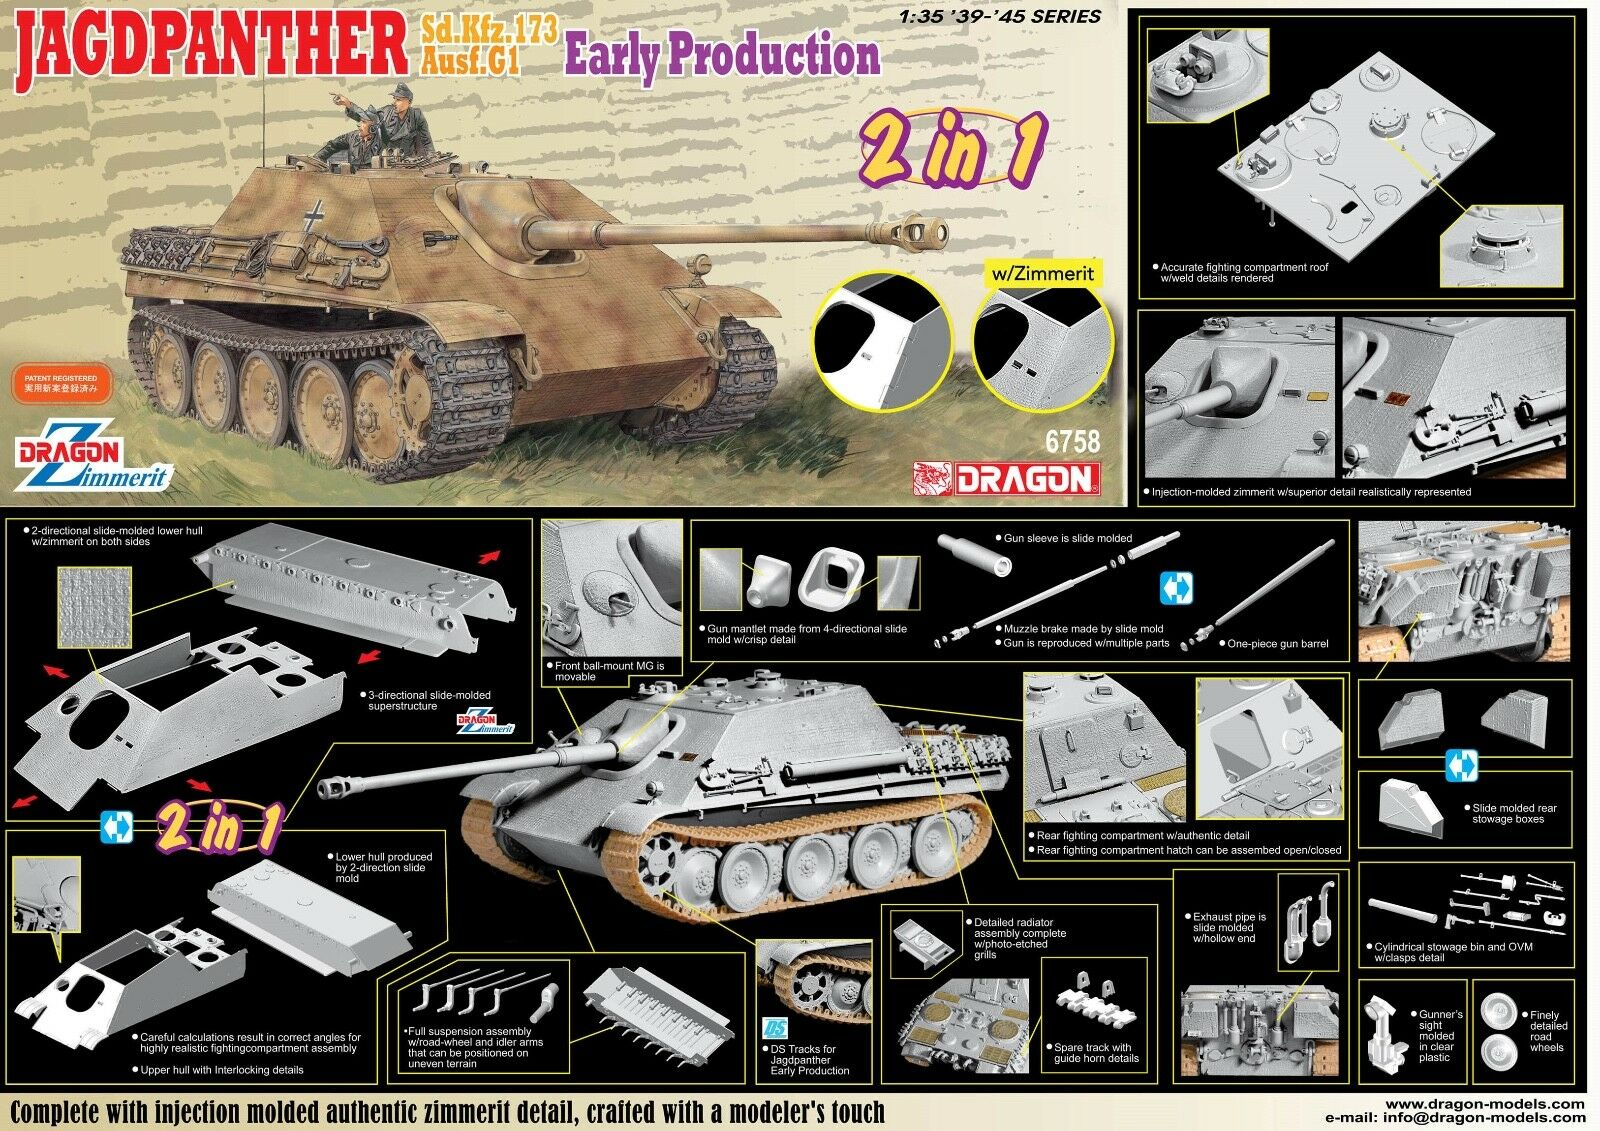 1  35 drake Sd.Kfz.173 Jagdpanther G1 Early Production (2 i 1)